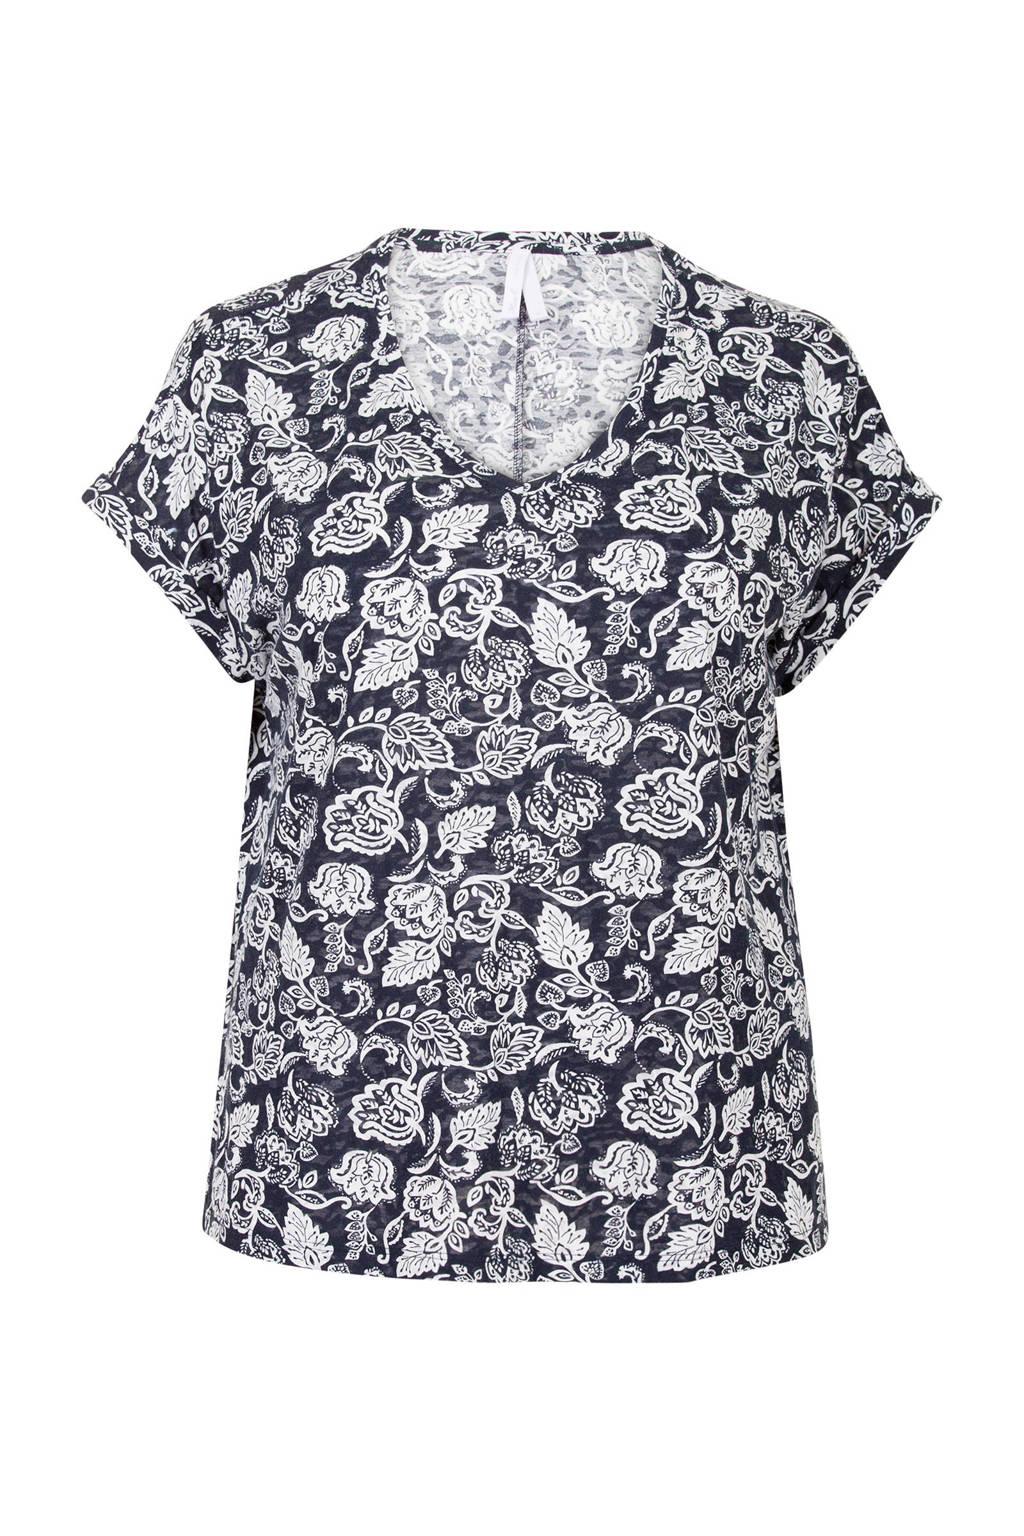 Miss Etam Plus T-shirt bloemenprint, Wit